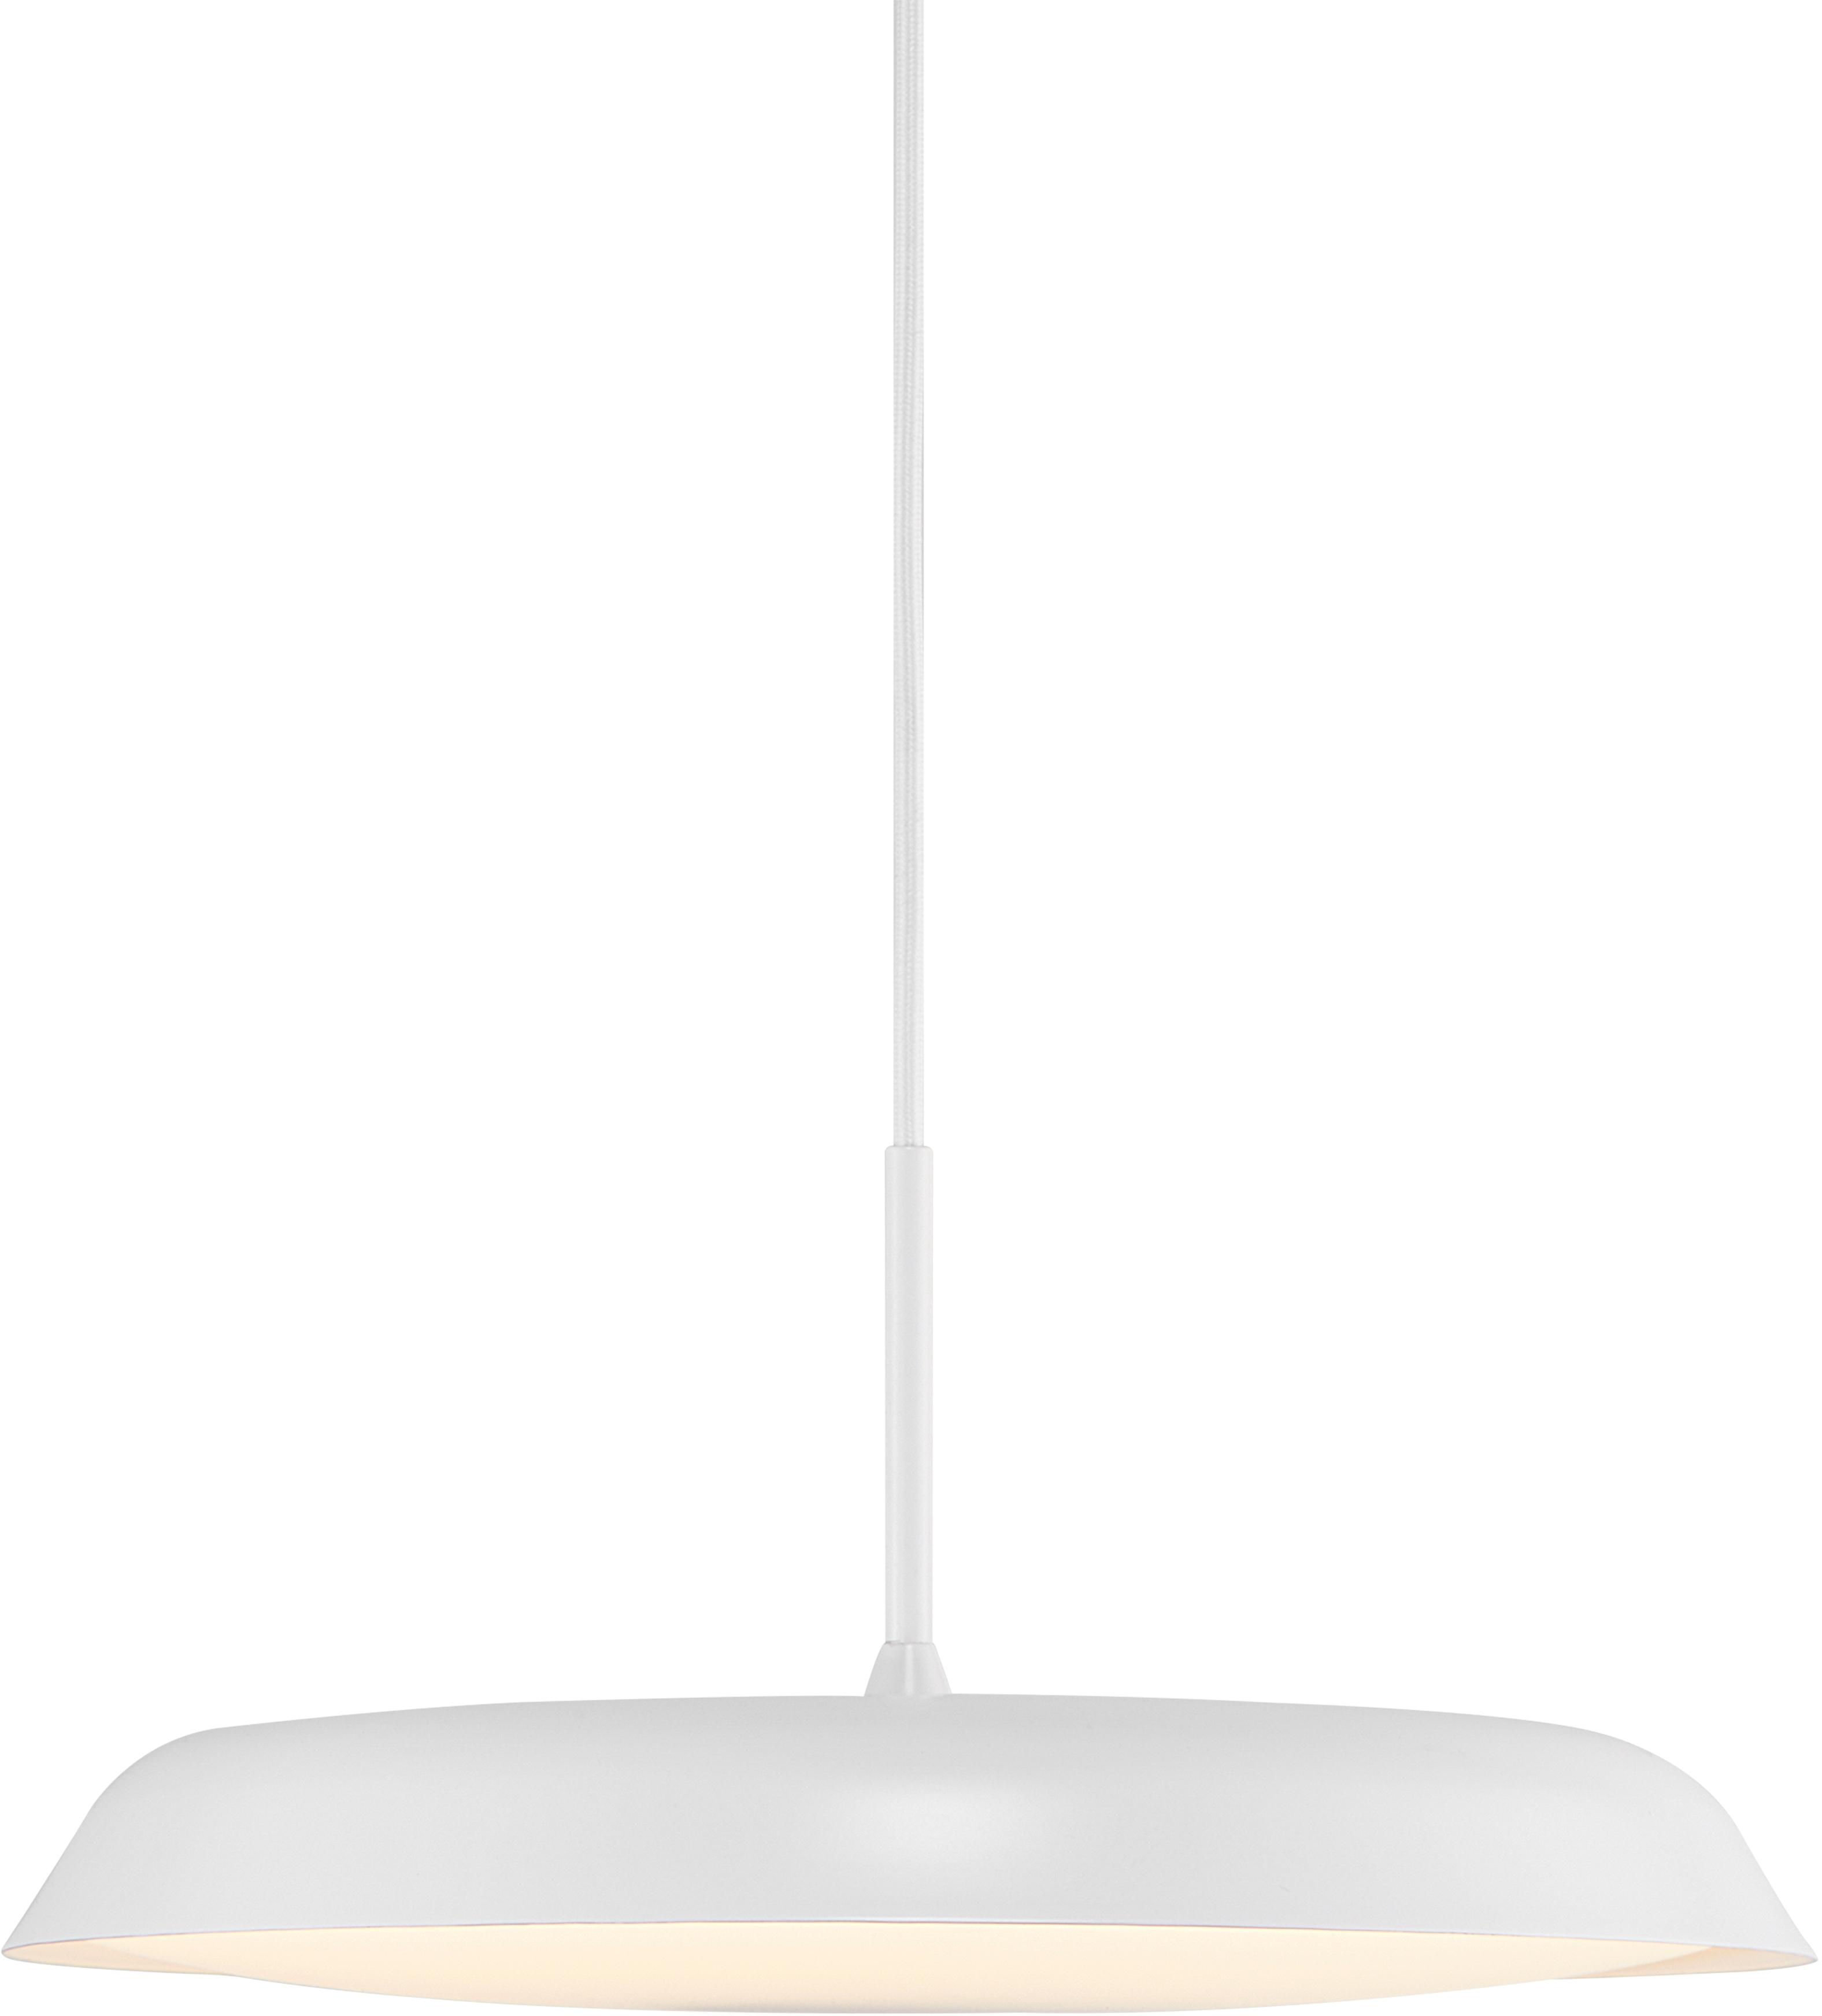 Nordlux LED Pendelleuchte PISO, LED-Modul, Hängeleuchte, inkl. LED Modul, inkl. Farbwechsel, 5 Jahre LED Garantie